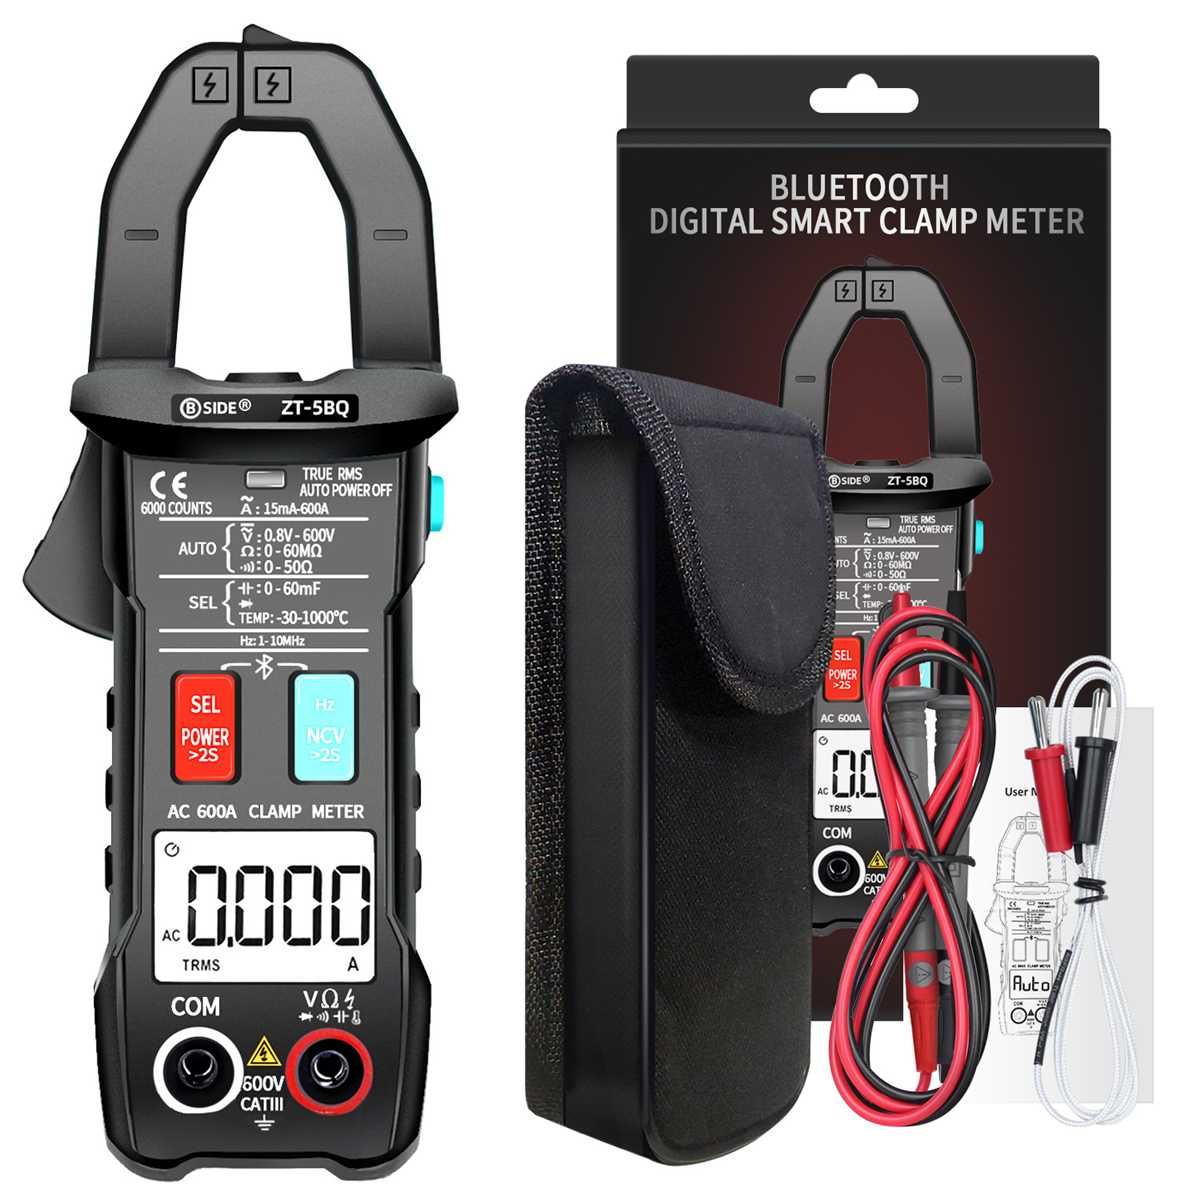 home improvement : HDMI USB 37MP 1080P 60FPS Digital Industrial Video Microscope Camera Recorder 180X 300X Lens For Phone PCB Repair Soldering